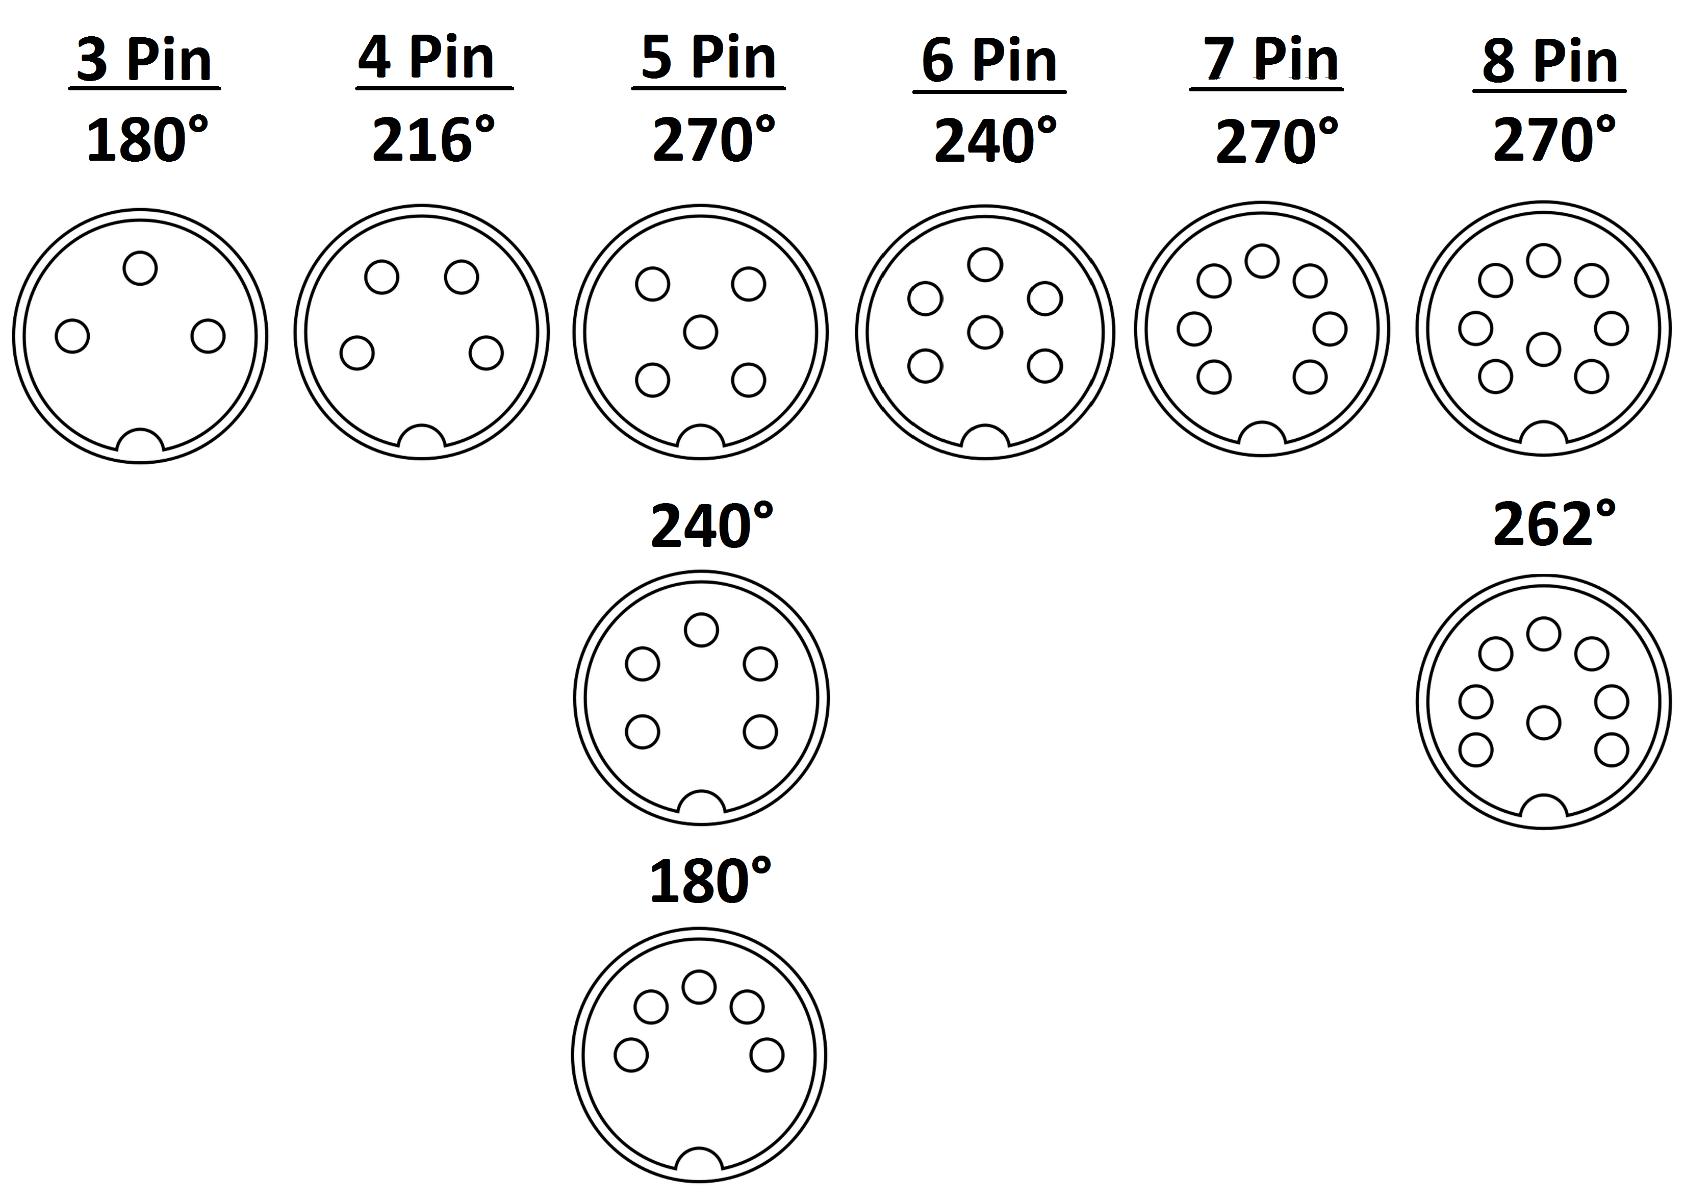 5 pin din plug wiring diagram for camera